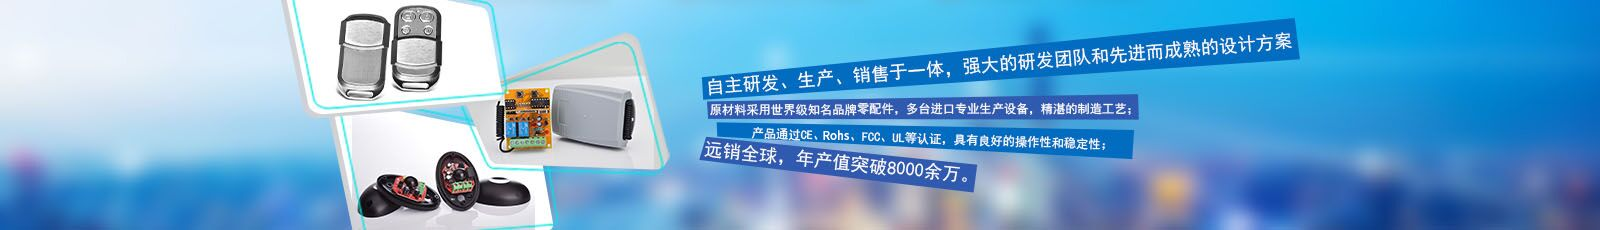 ao门电wan城网zhan无线yao控qi月产量达500000件